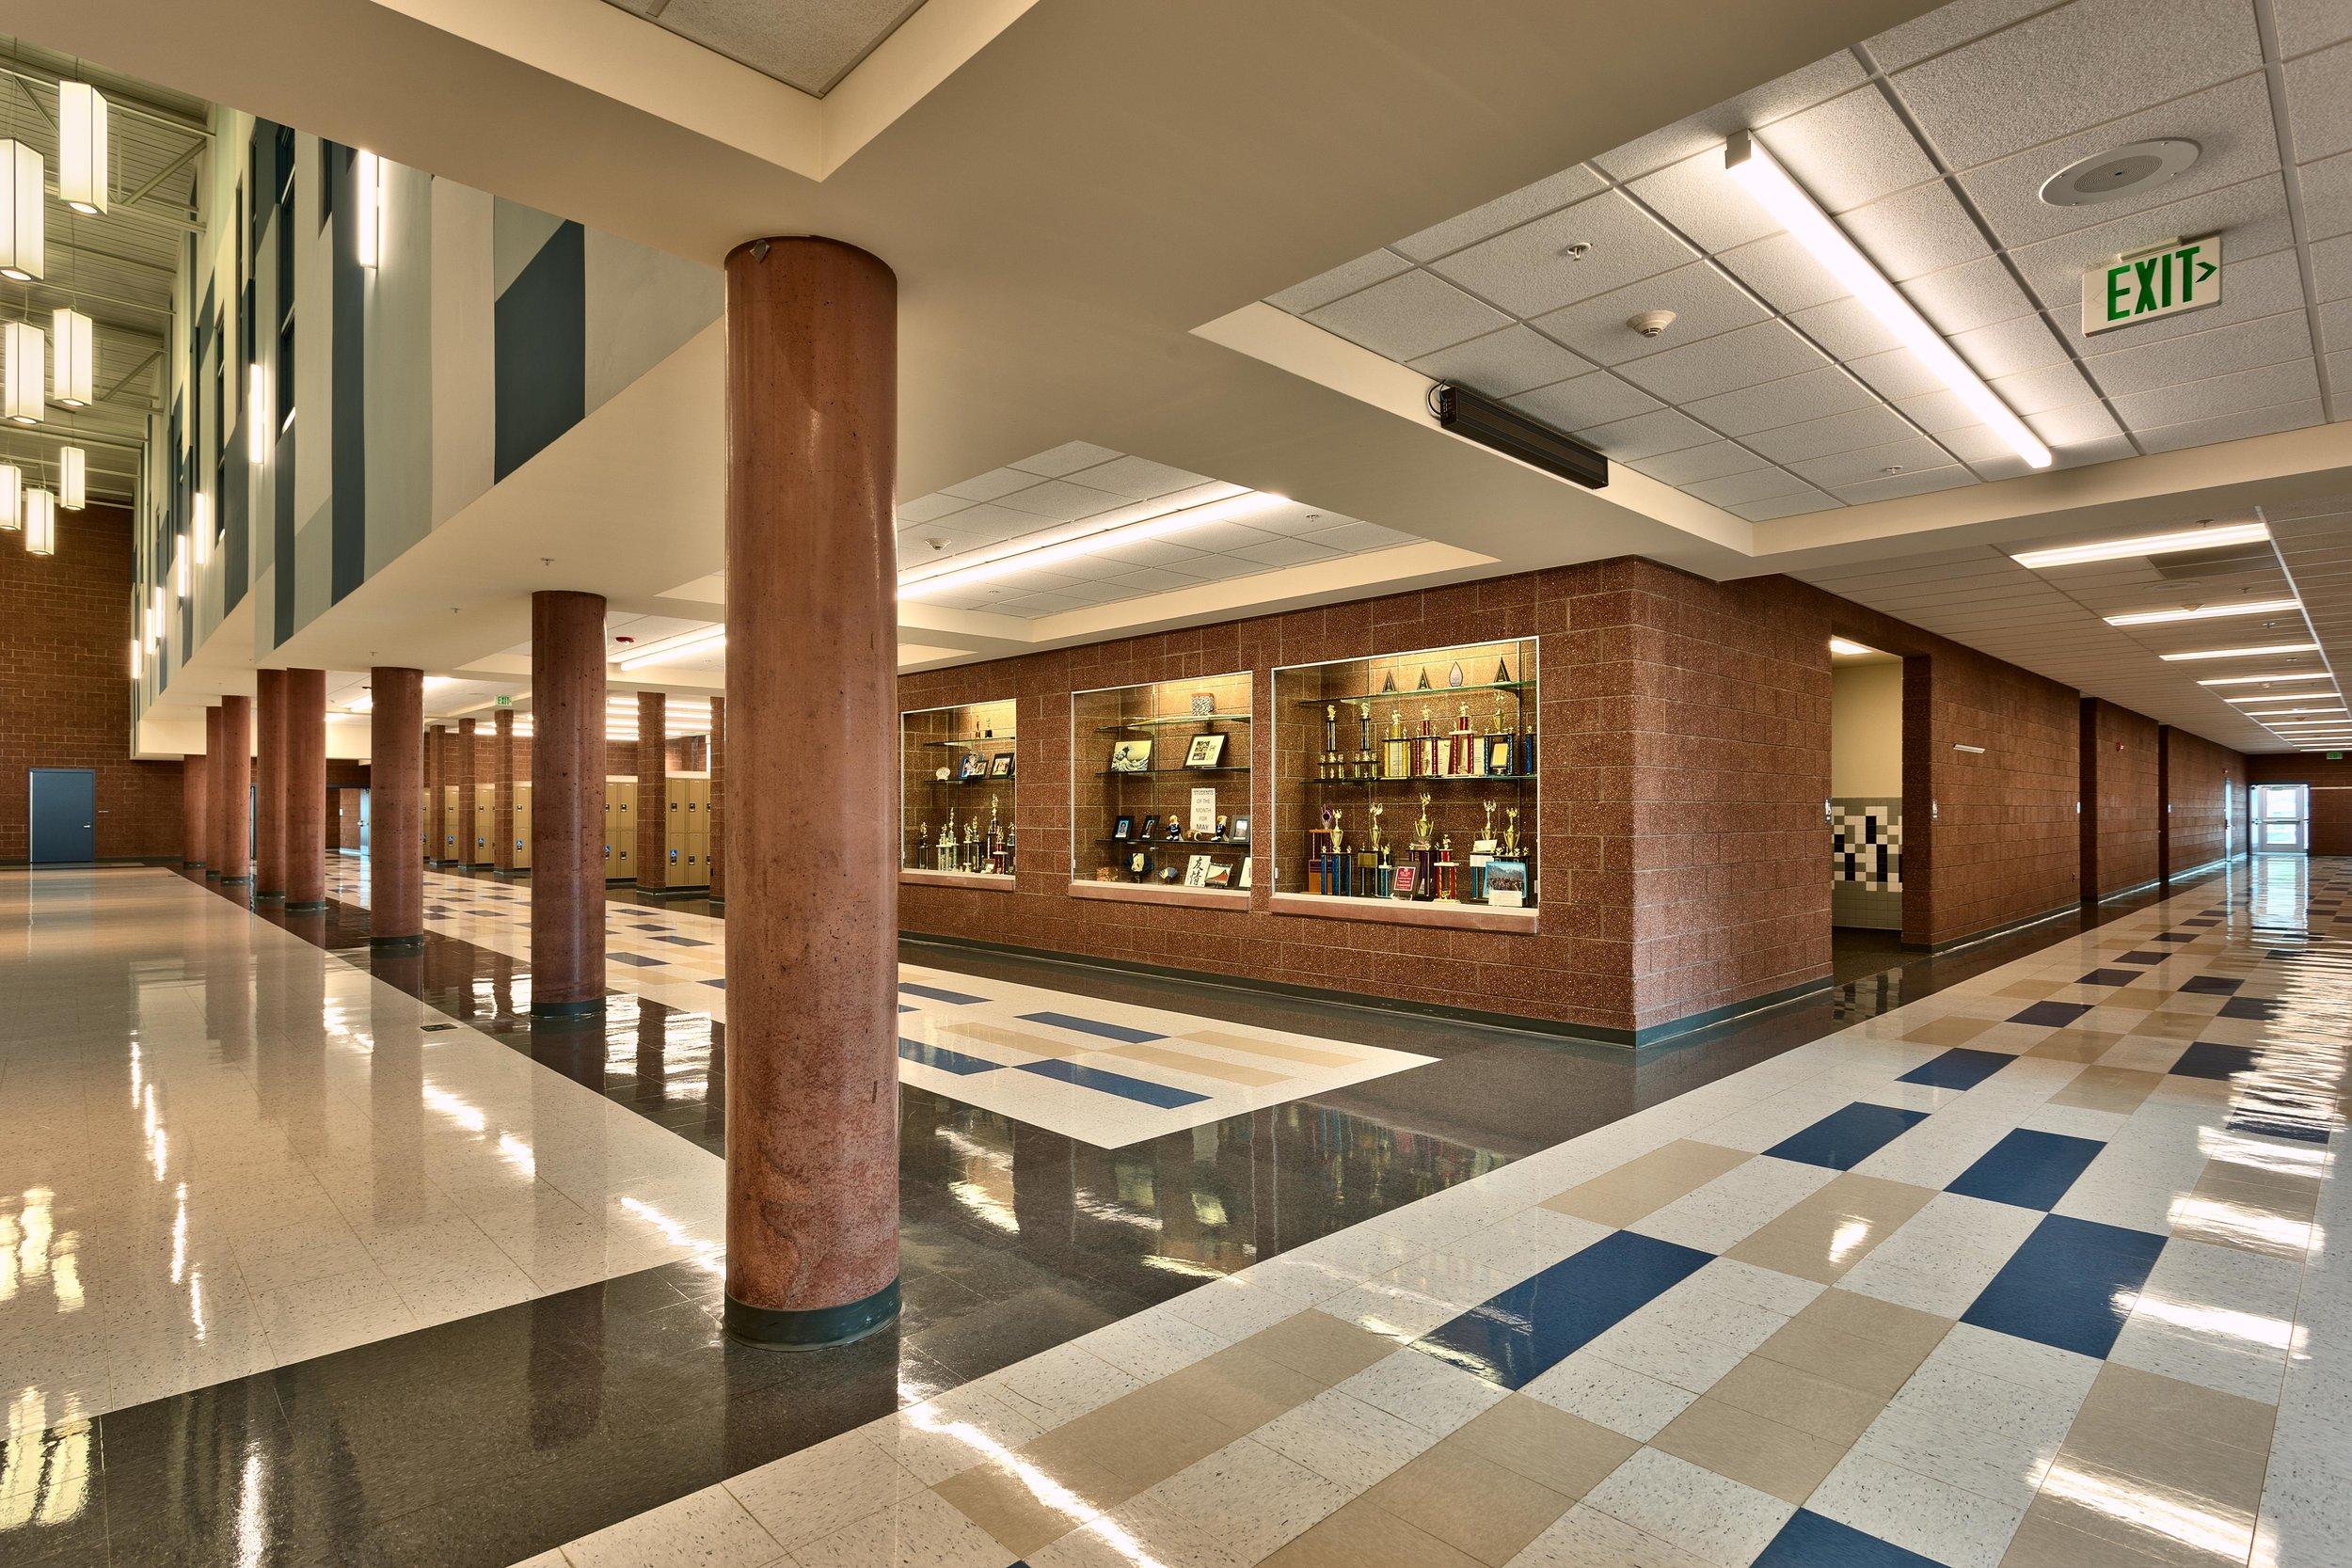 BHB_Dixie Middle School Lobby.jpg